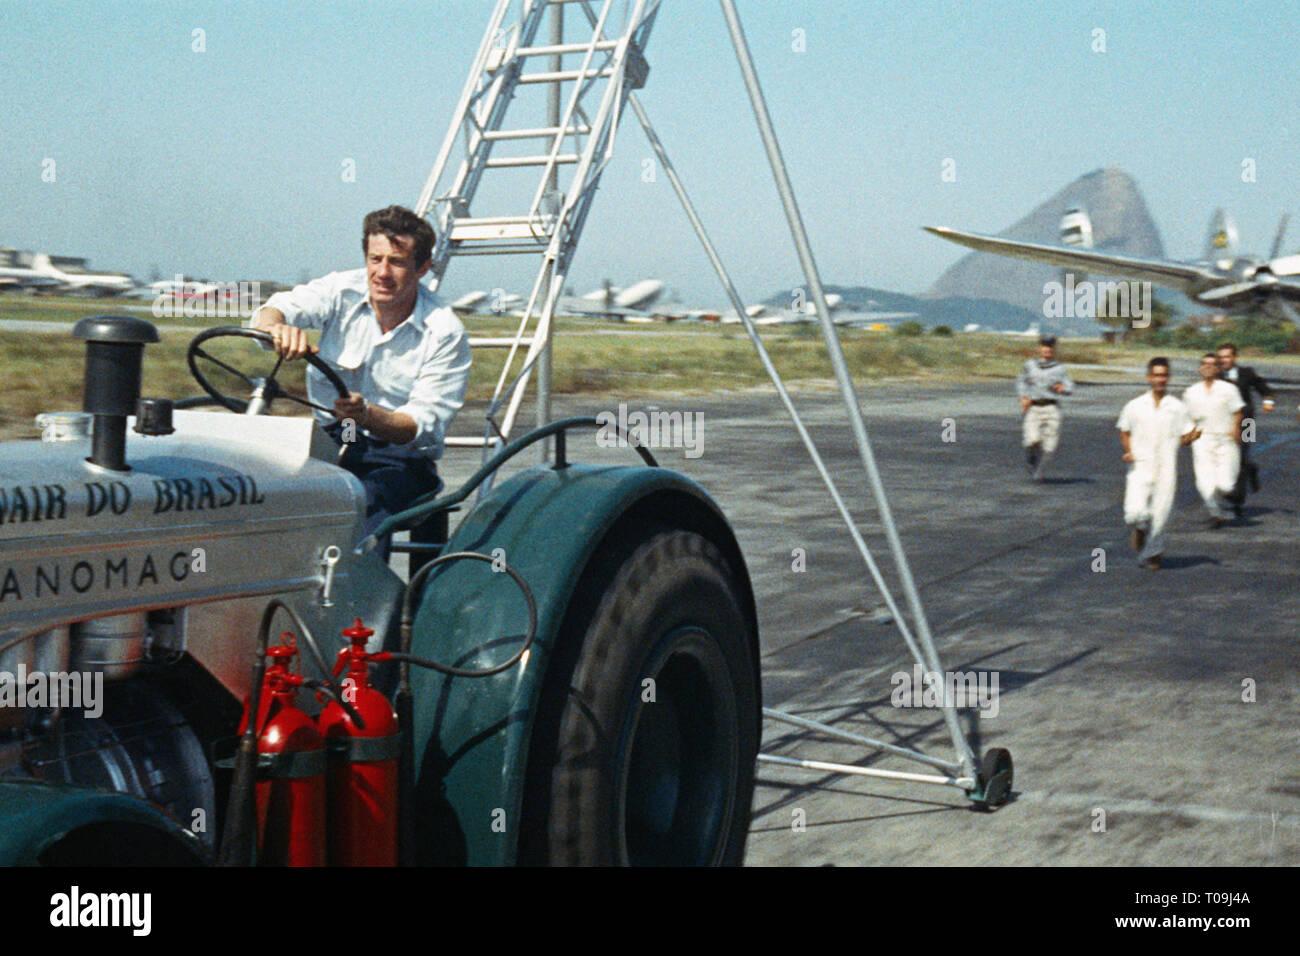 L'HOMME DE RIO 1964 de Philippe De Broca 1964 FRA./ITA. Jean-Paul Belmondo. aventure; adventure Prod DB © Films Ariane - Les Productions Artistes Asso - Stock Image